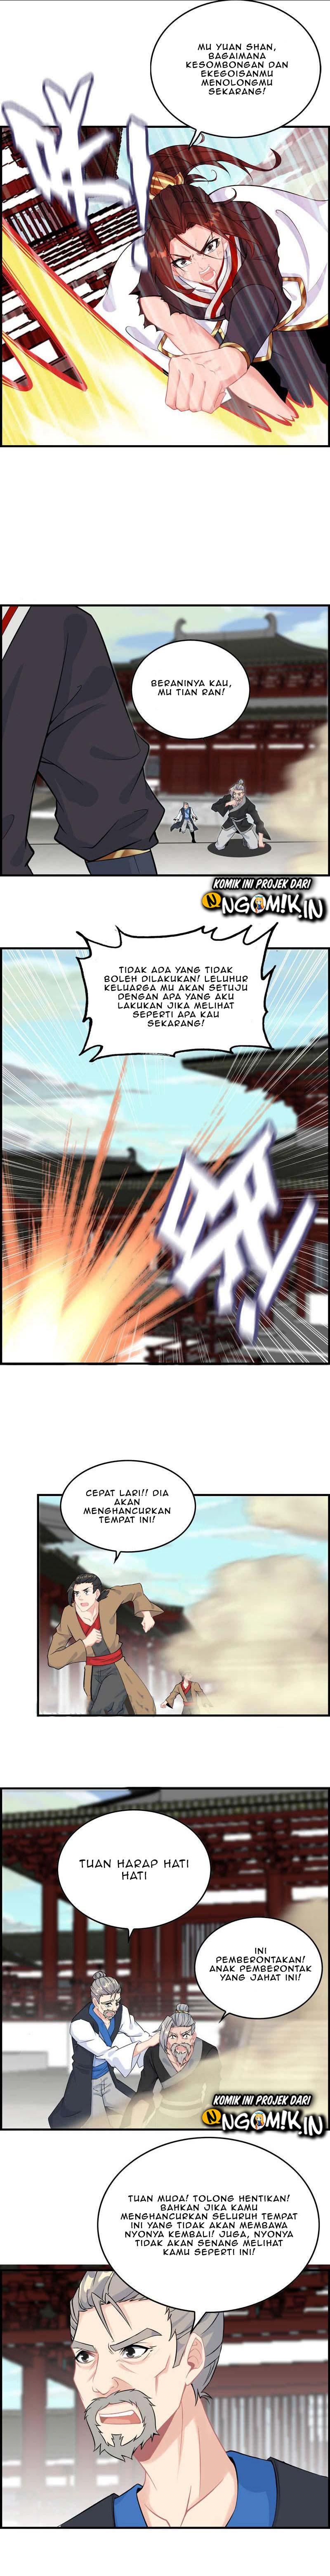 Vengeance Of The Heavenly Demon Chapter 32